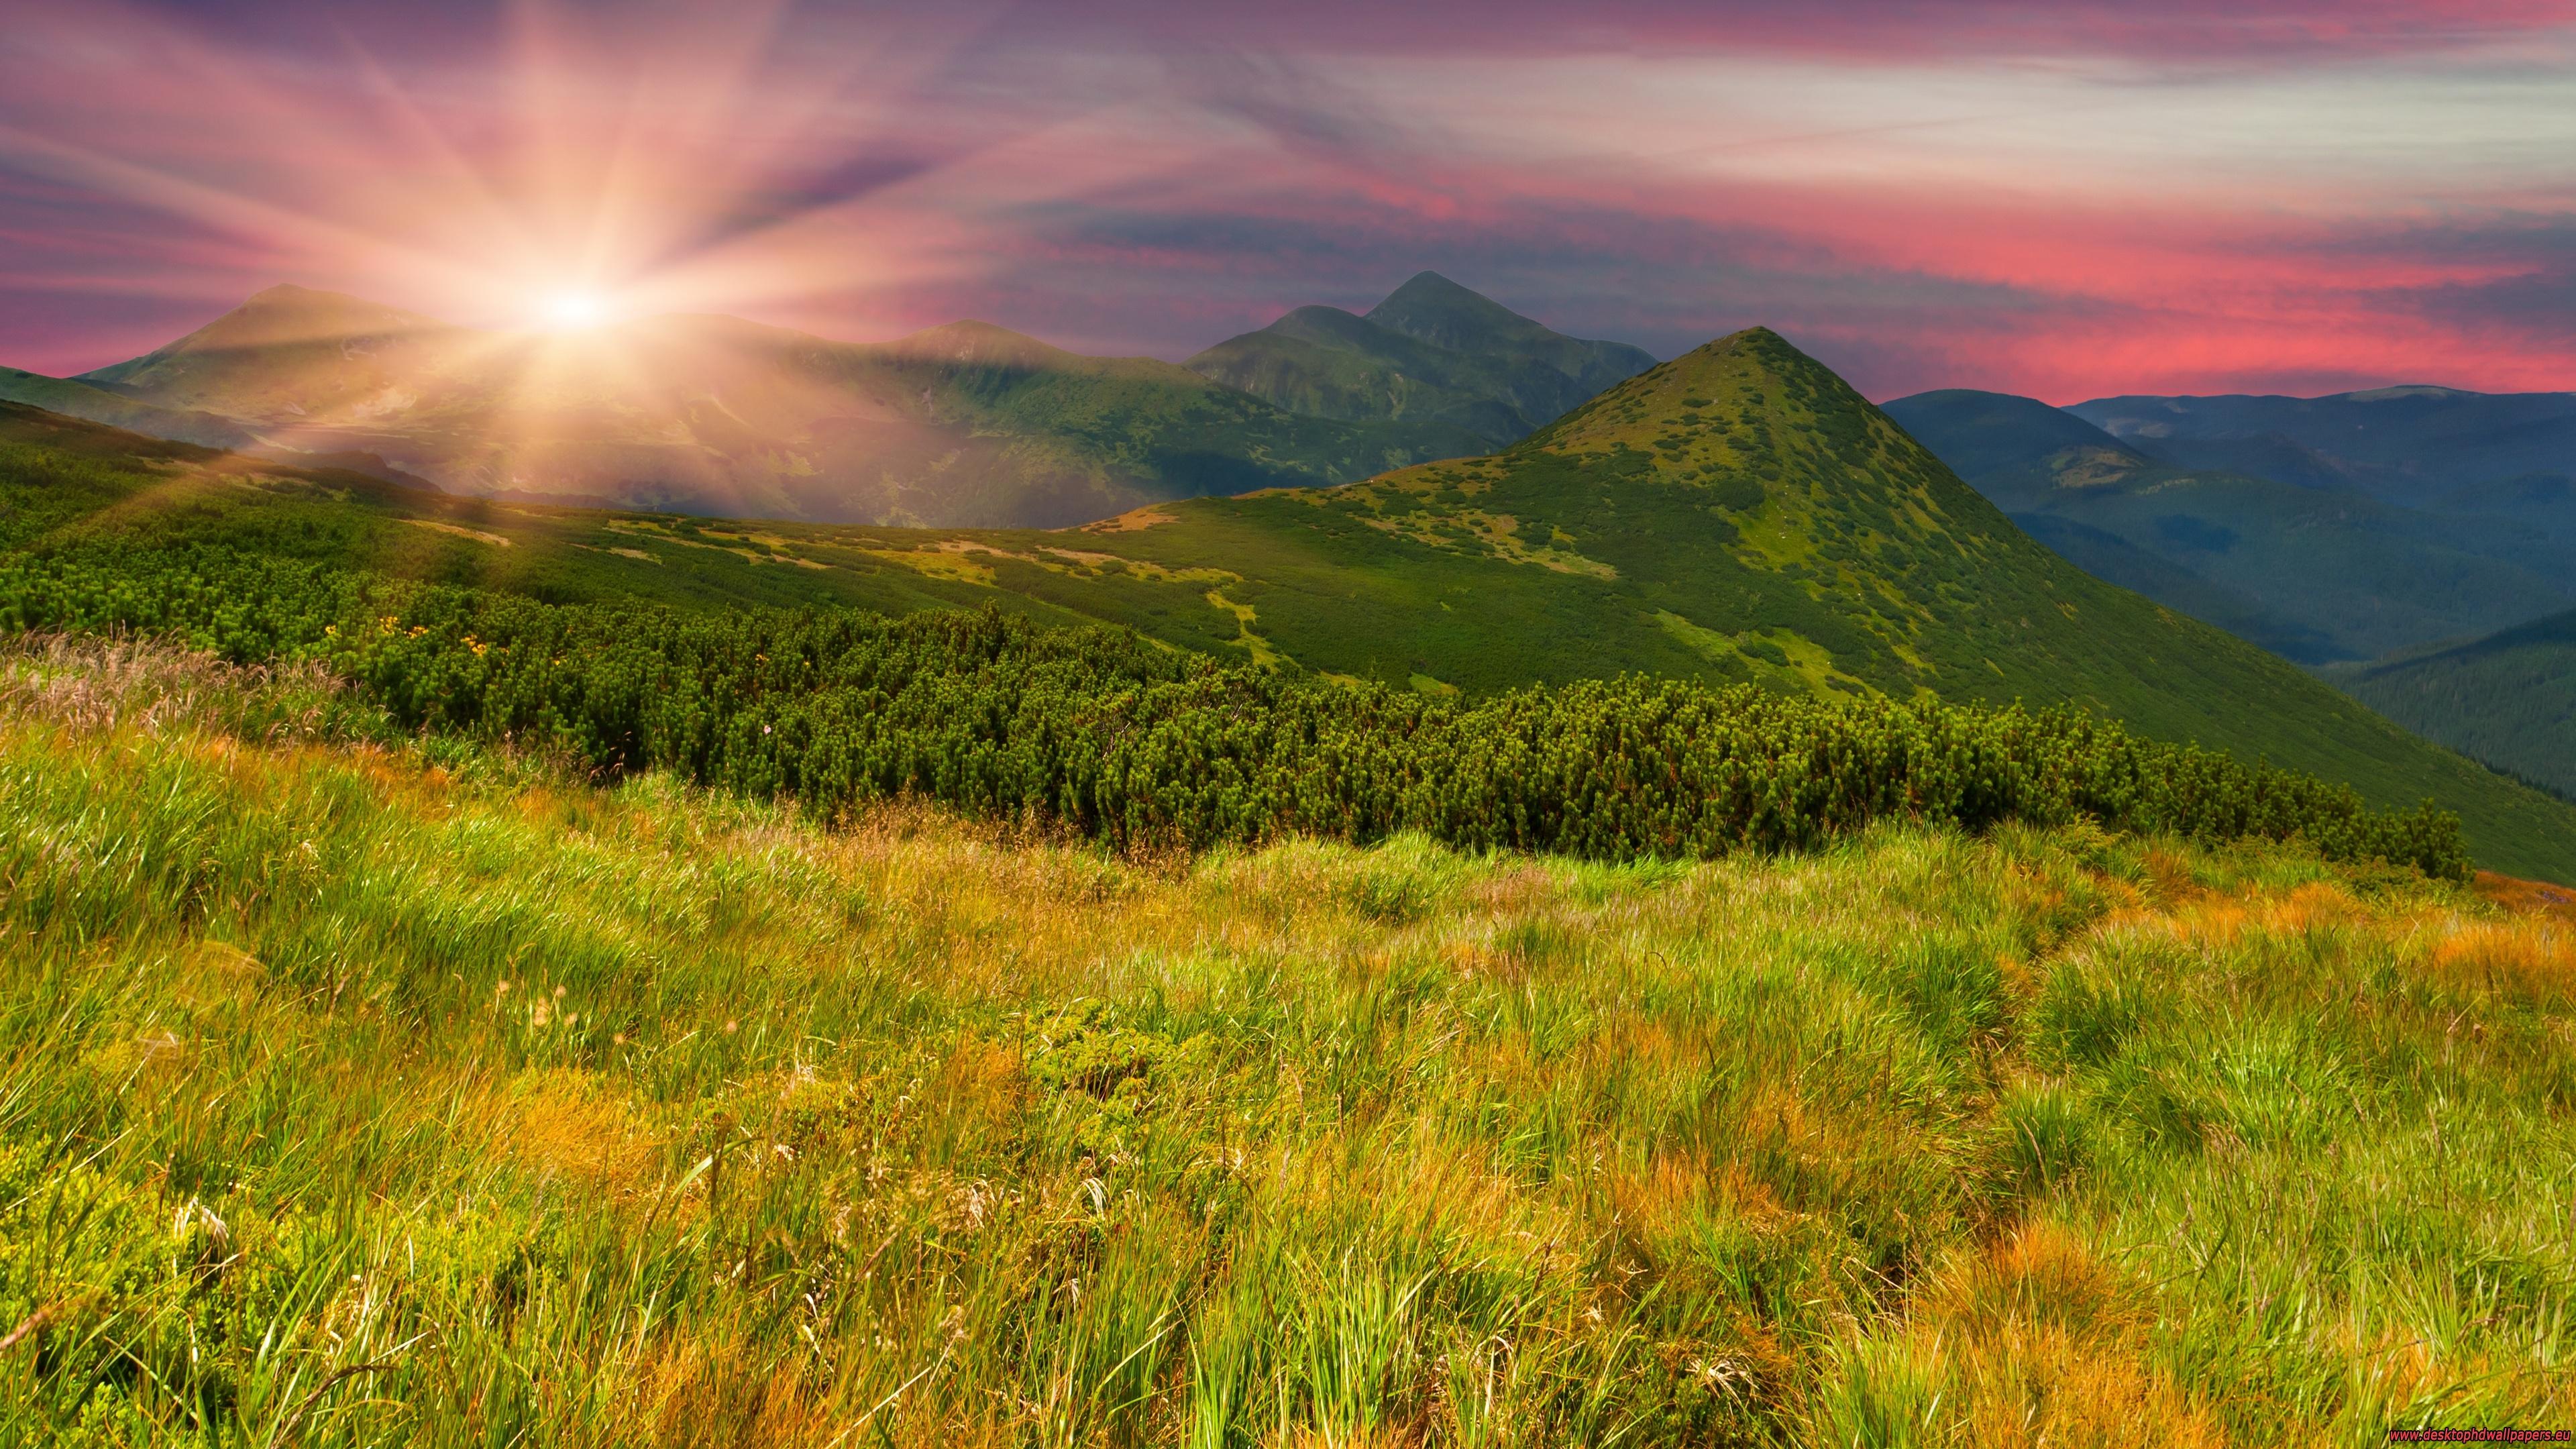 Field & Sunrise 3840x—2160 Wallpaper